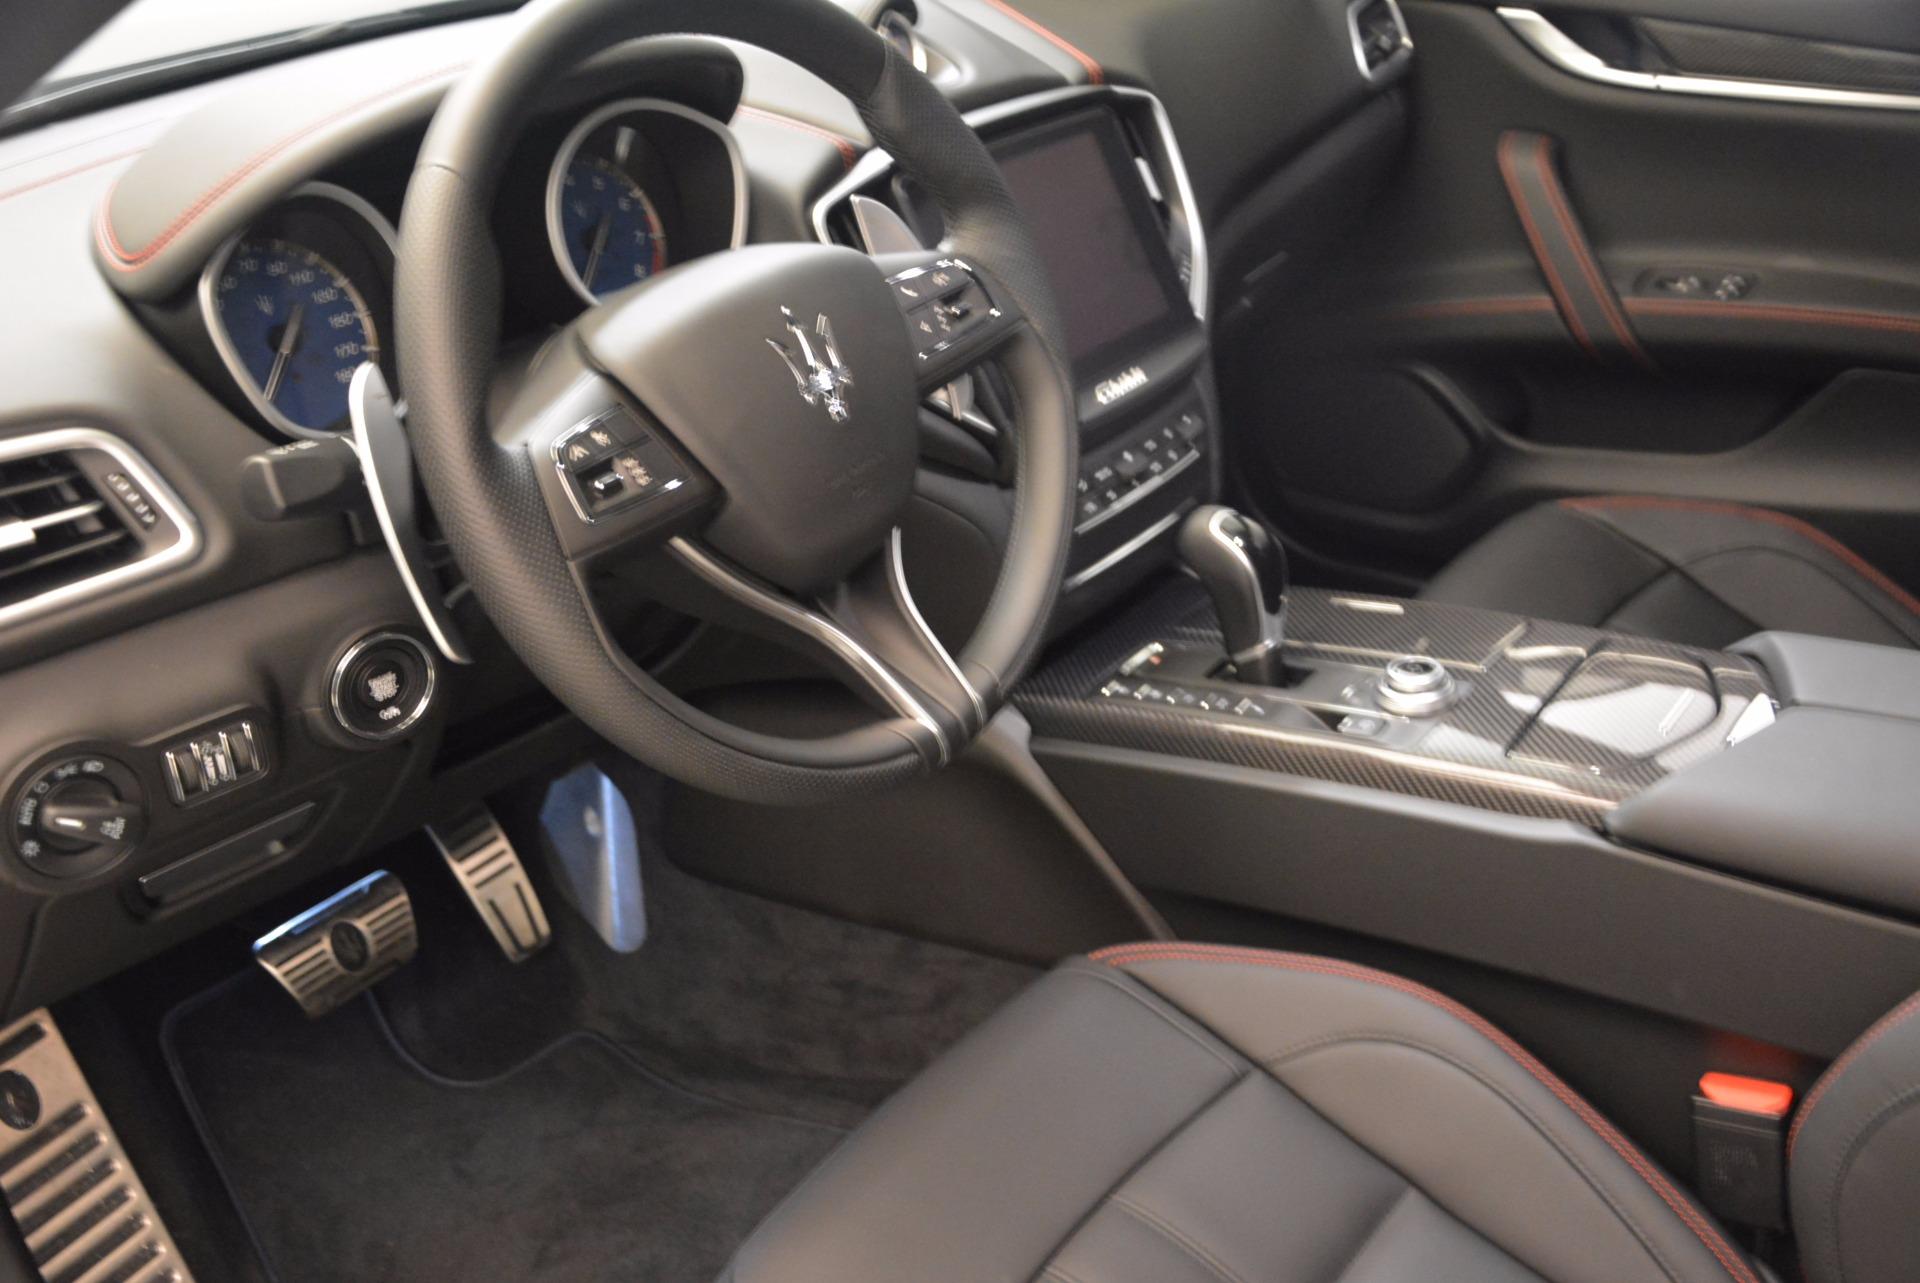 New 2018 Maserati Ghibli S Q4 Gransport For Sale In Greenwich, CT 1855_p13